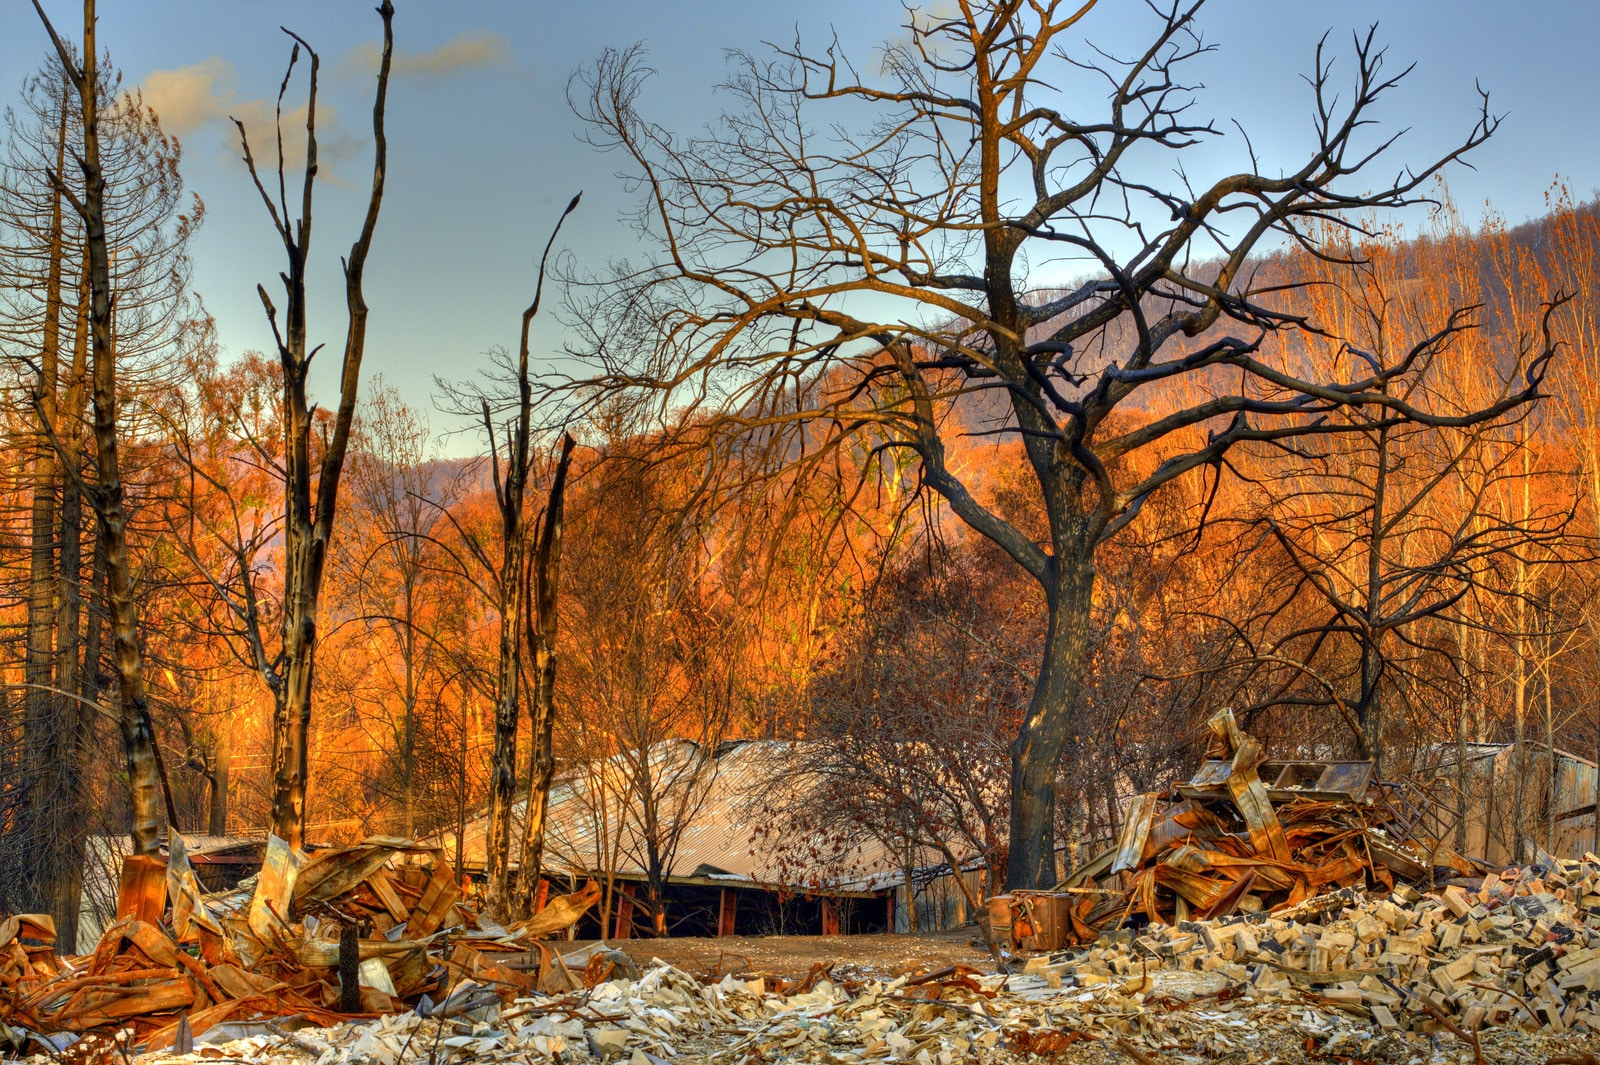 Wildfire Safety Network